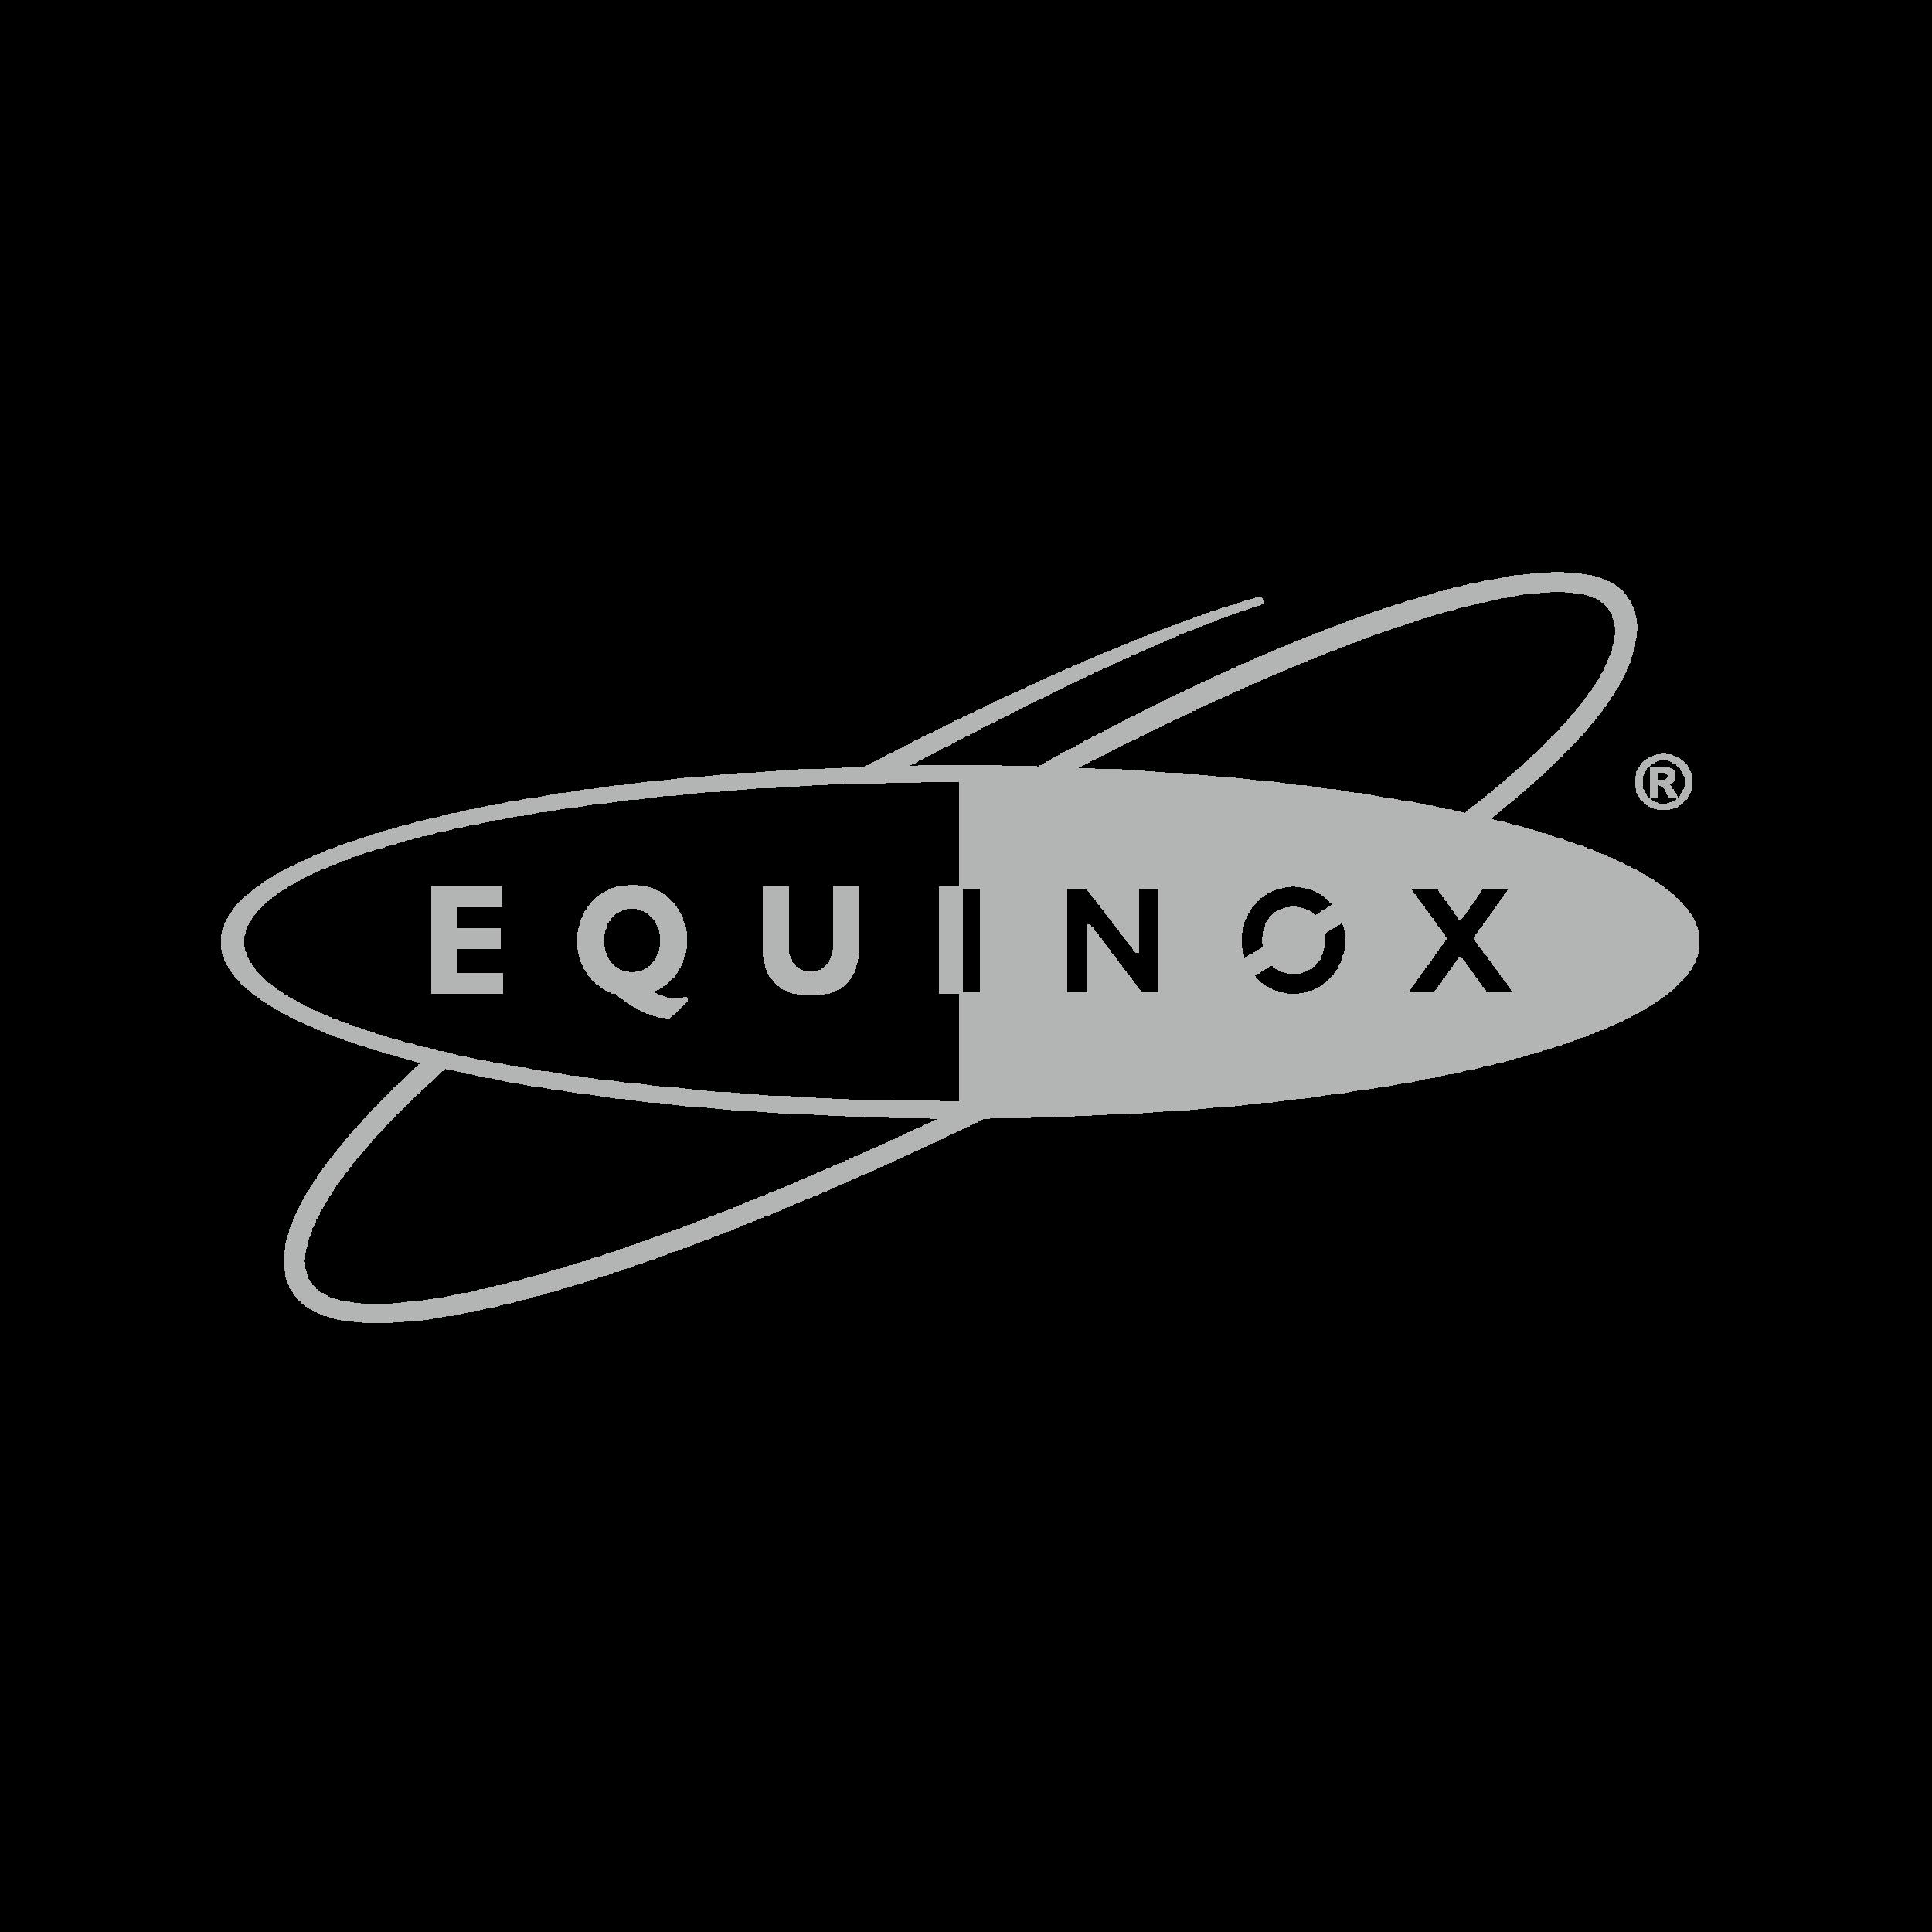 Equinox.png